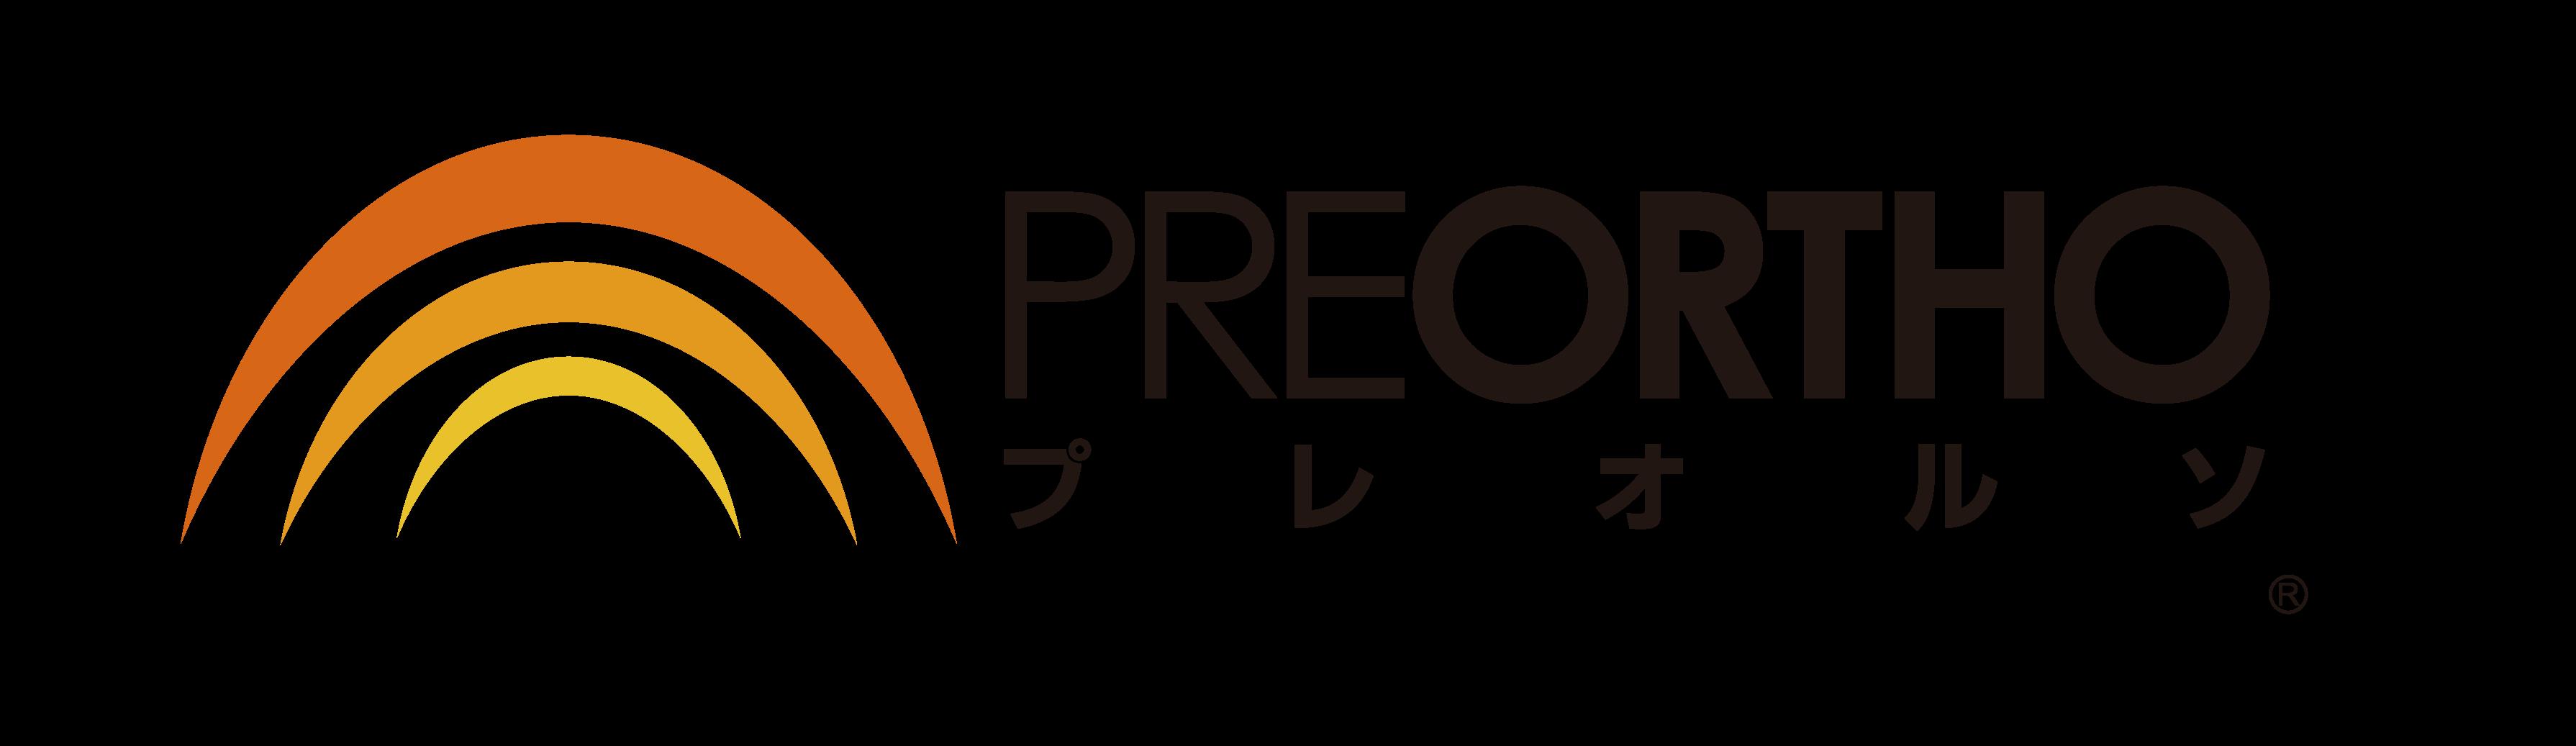 preorth_logo